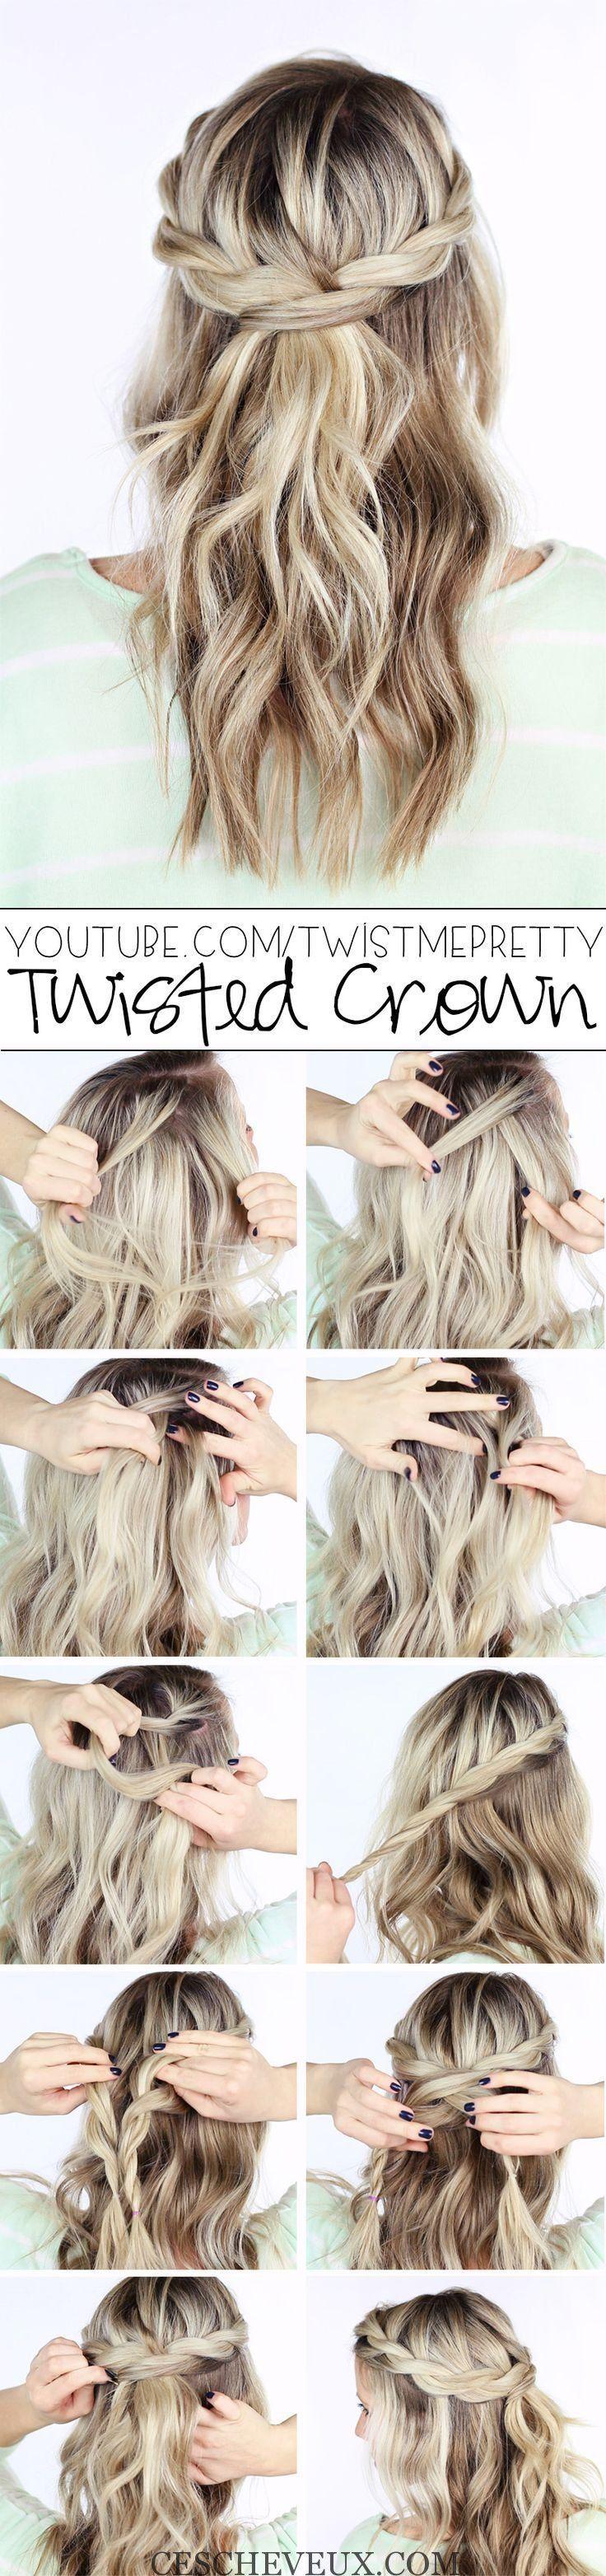 Chic twisted updo moitié coiffure vogcoiffure tresse braid